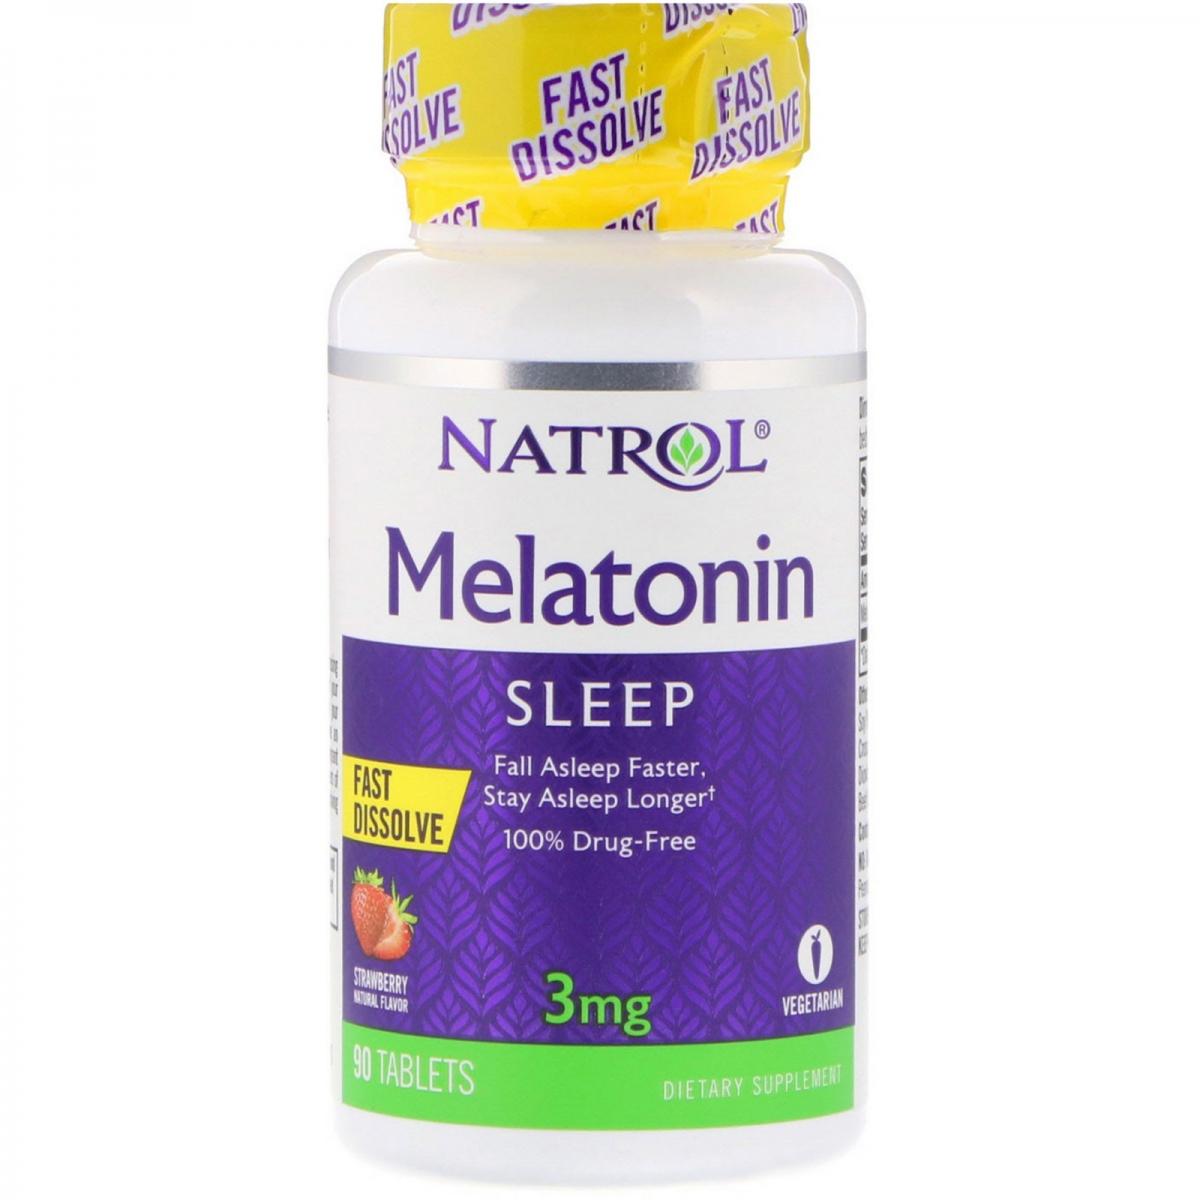 Natrol Melatonin Fast Dissolve 3 Mg